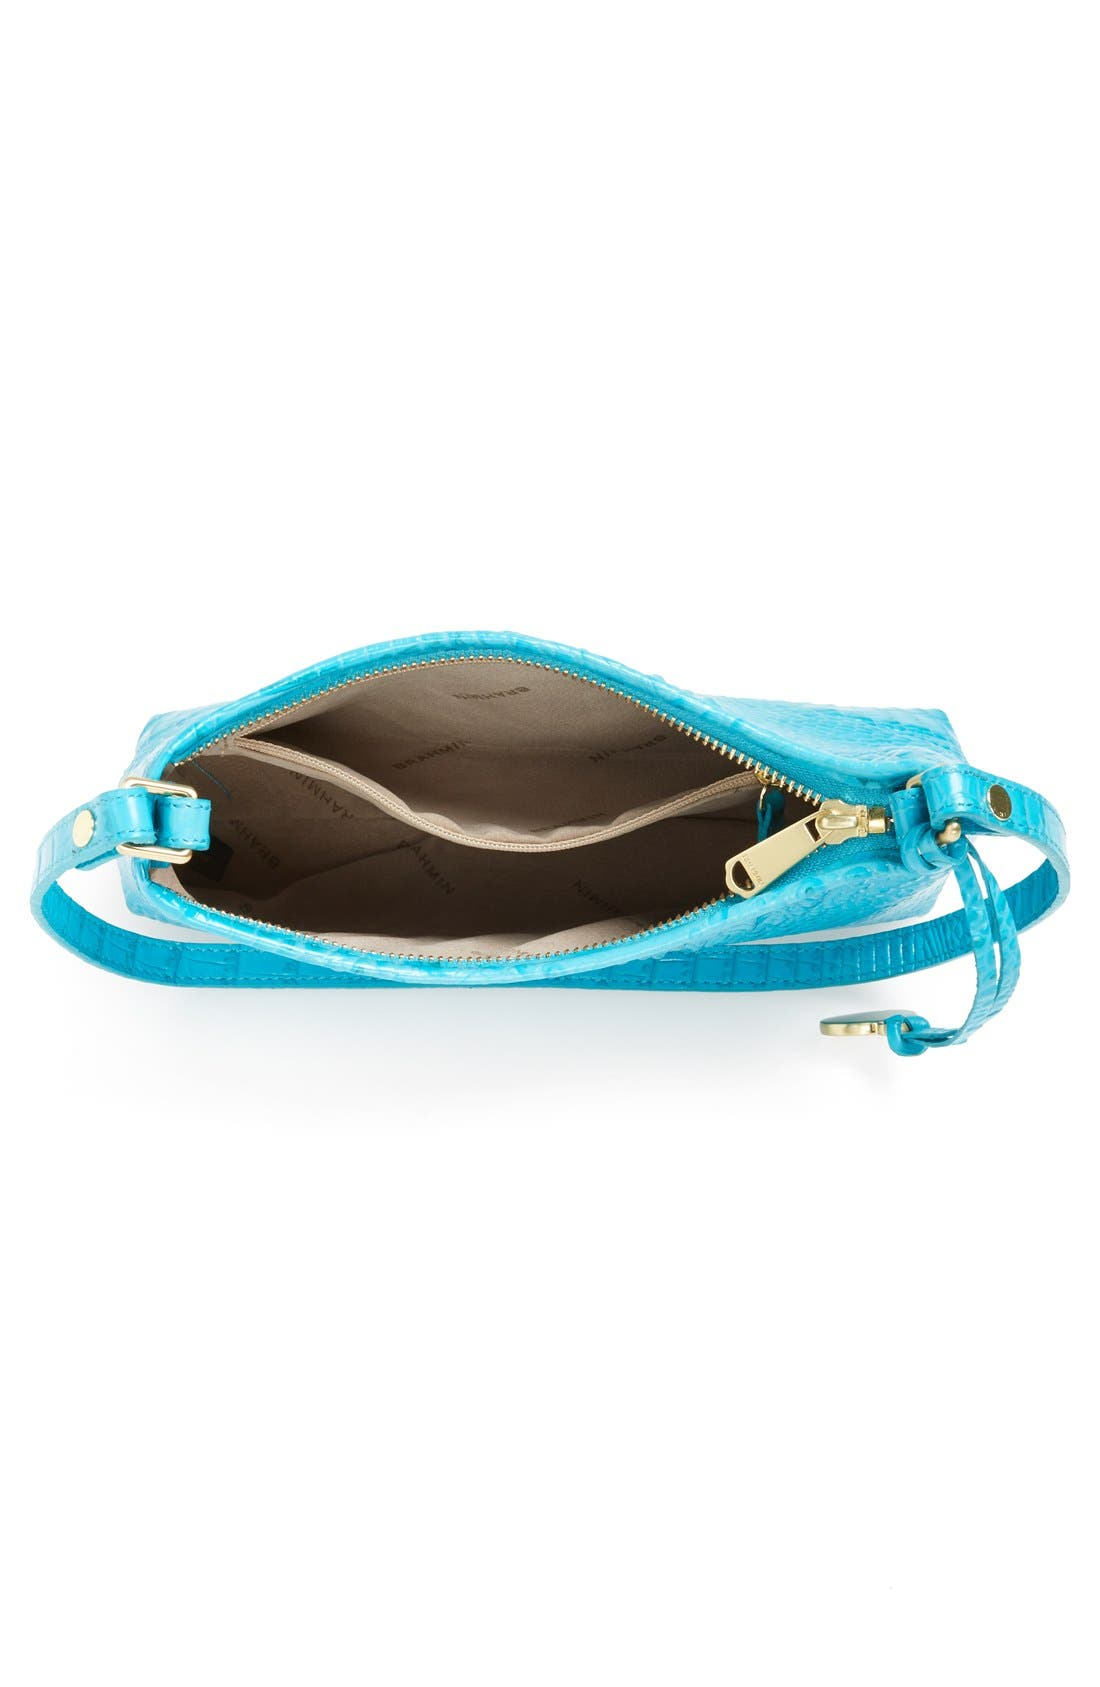 'Anytime - Mini' Convertible Handbag,                             Alternate thumbnail 65, color,